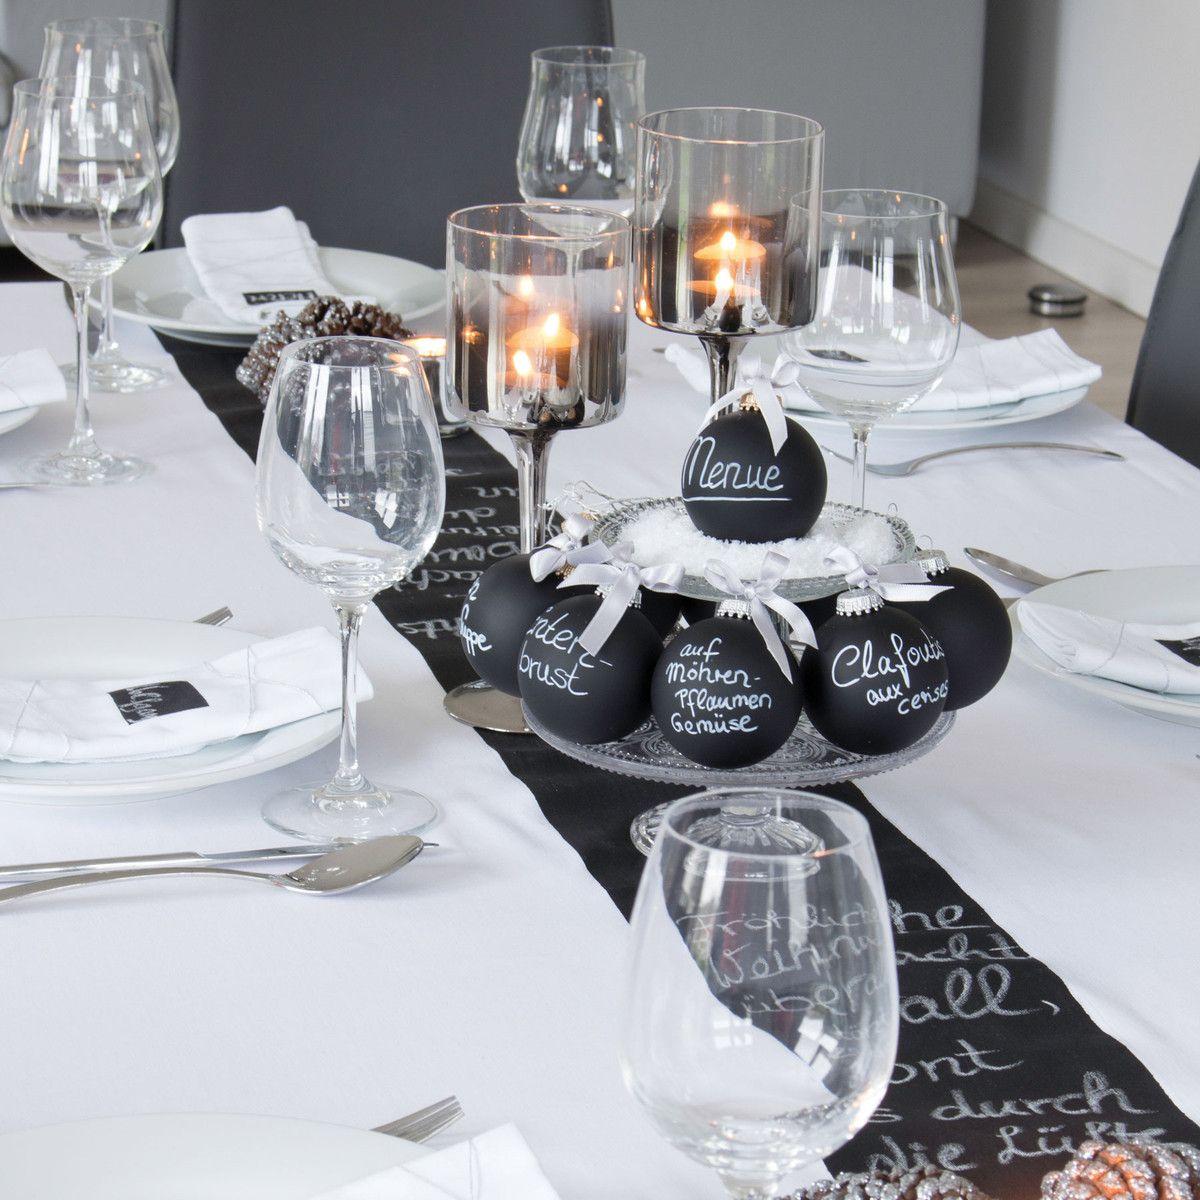 corpus delicti black magic diy baumkugel 2er set schwarz matt weihnachtsdeko pinterest. Black Bedroom Furniture Sets. Home Design Ideas